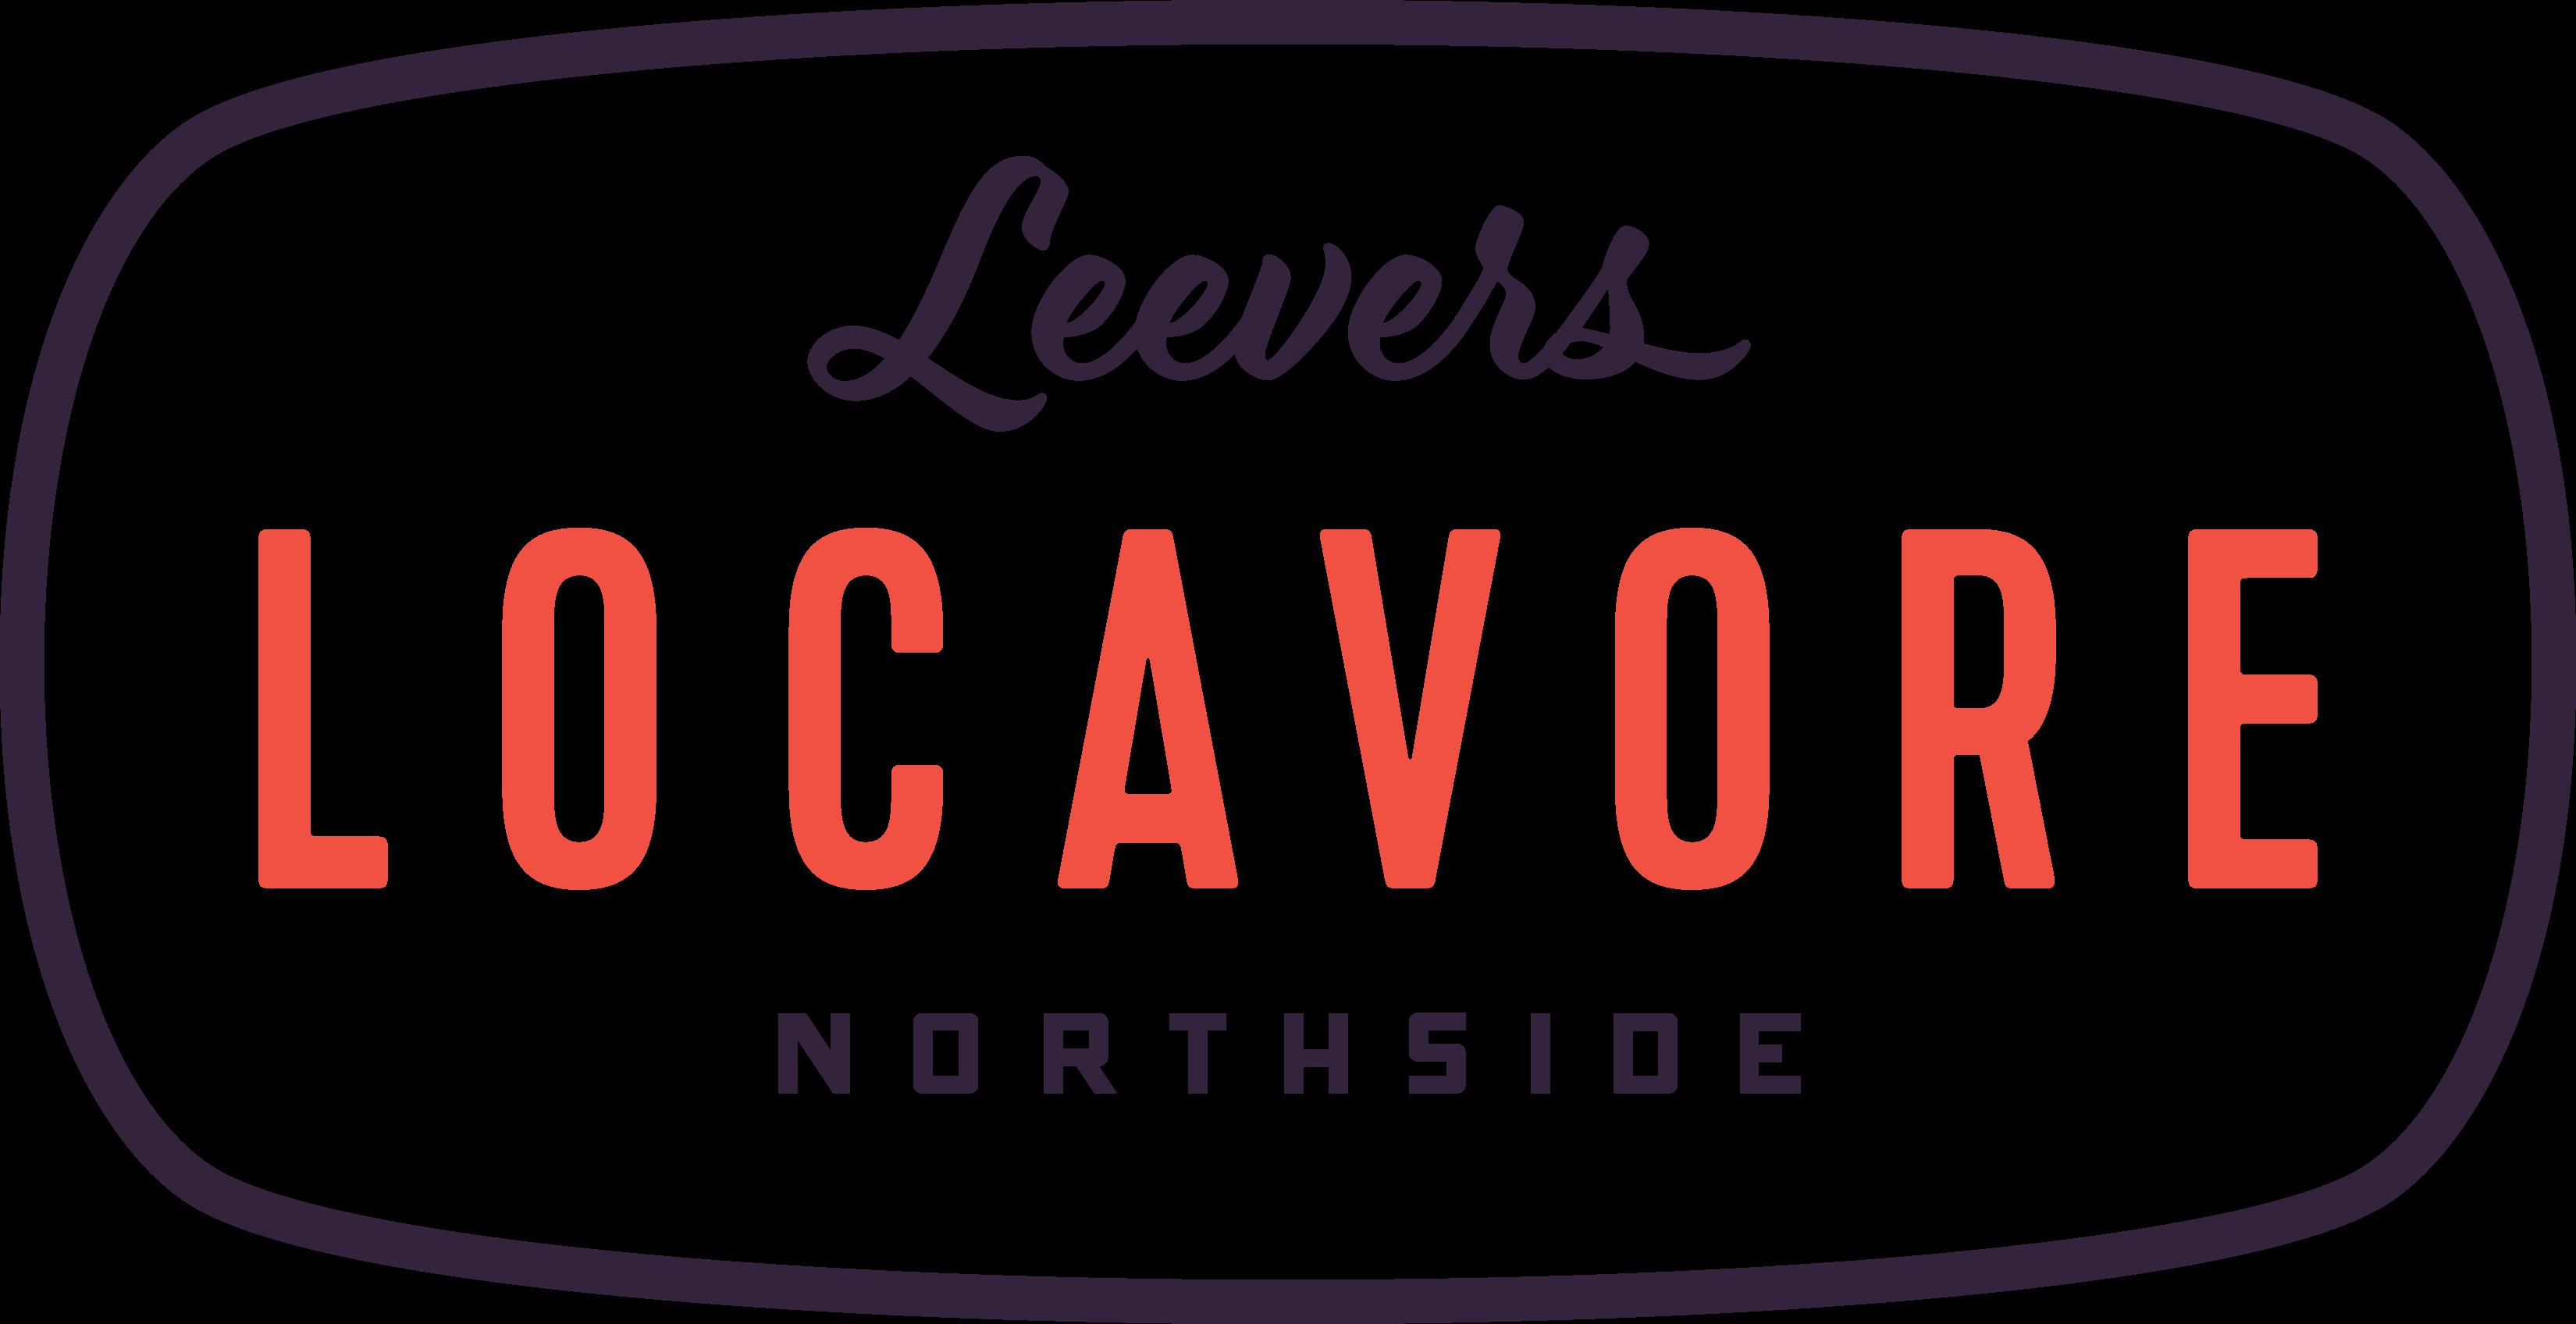 Leevers Locavore